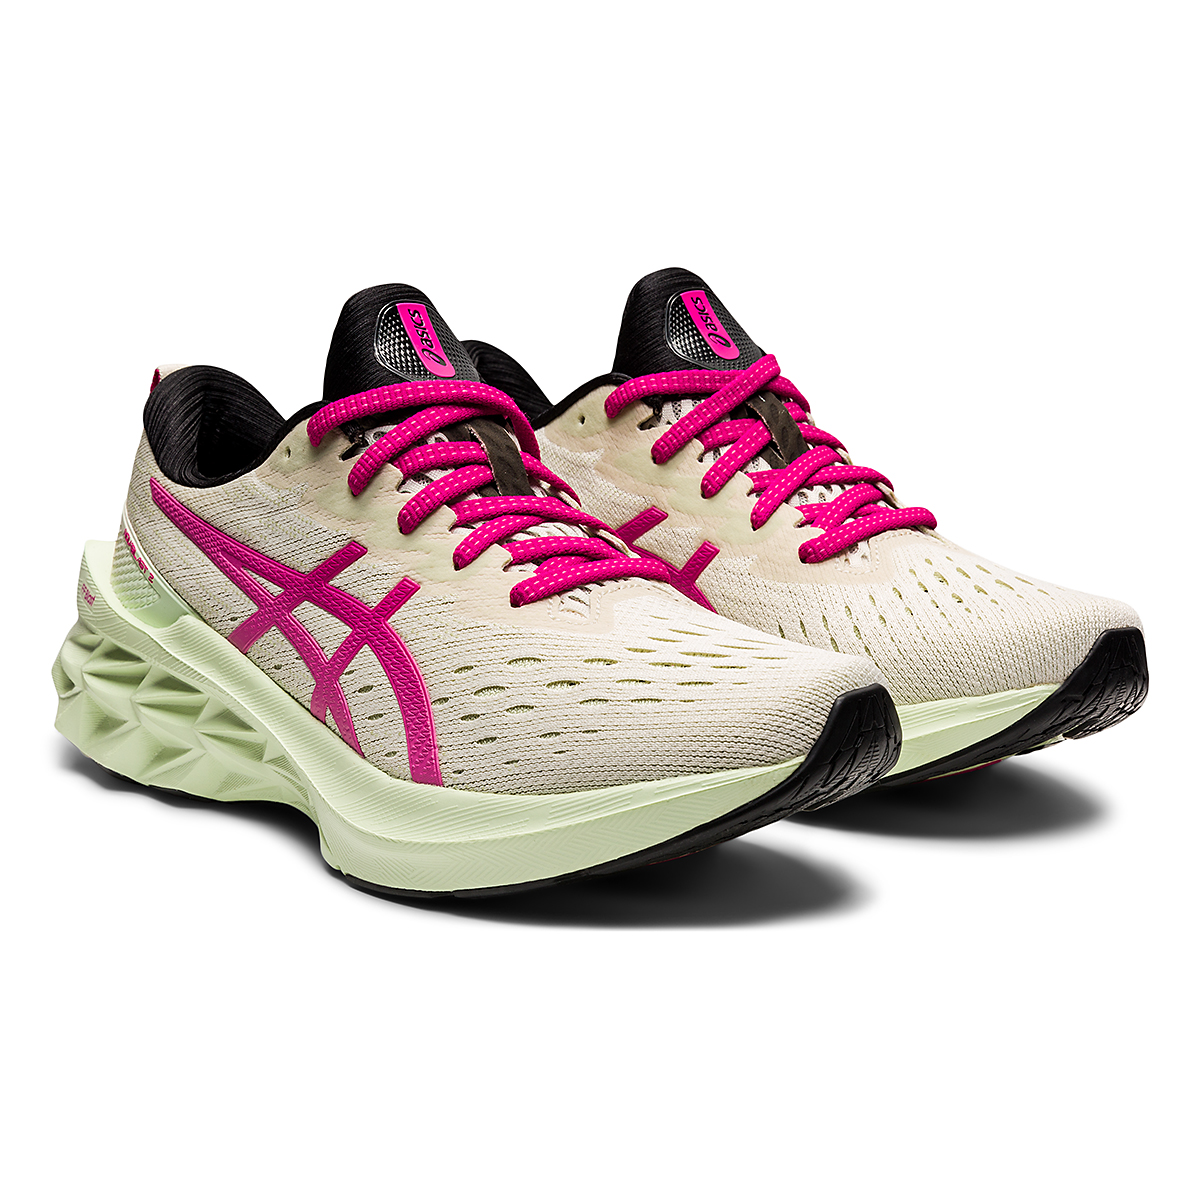 Women's Asics Novablast 2 Running Shoe - Color: Birch/Pink Rave - Size: 5 - Width: Regular, Birch/Pink Rave, large, image 3